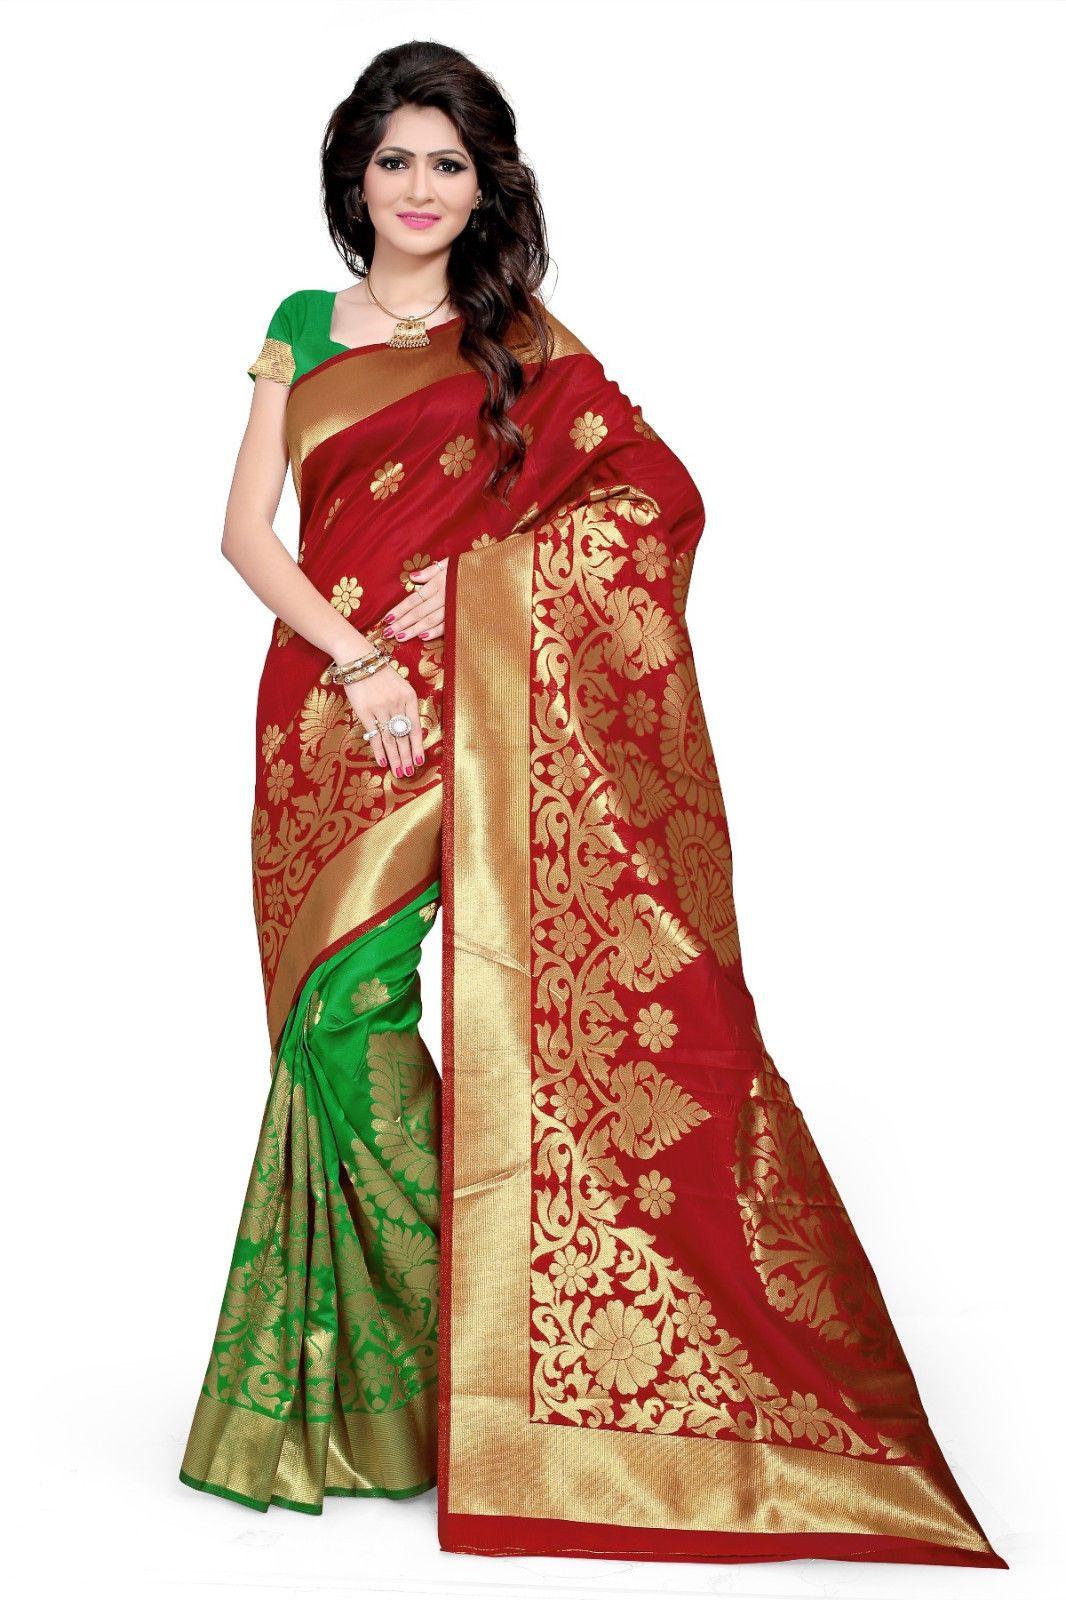 df95d4f3b9f9 Indian Banarsi Silk Saree Designer Pallu Party Wear Sari Bollywood Wedding  Dress